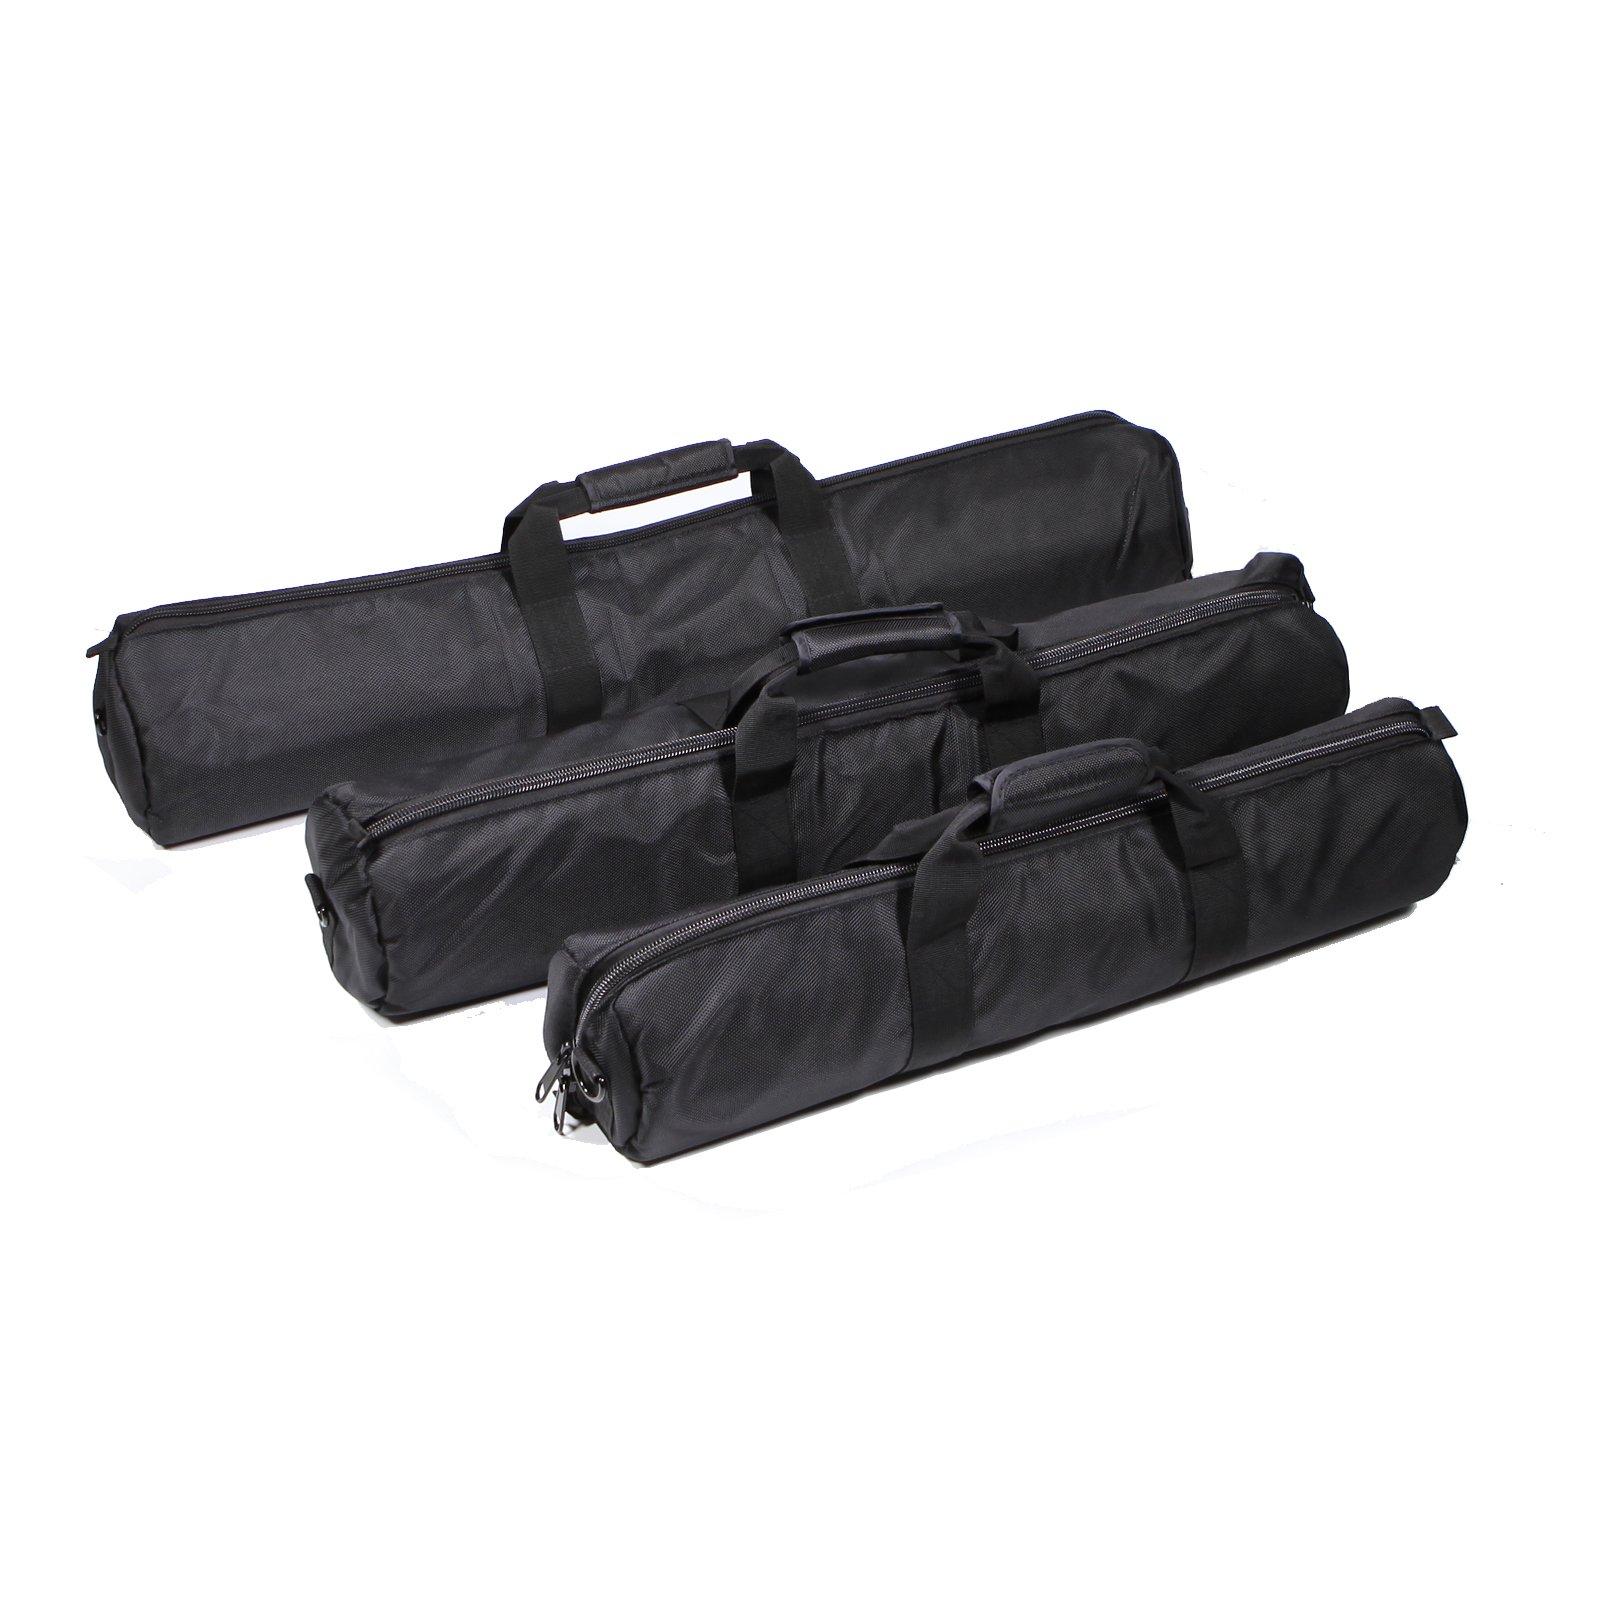 Meking 30''/75cm Padded Tripod Zipper Case Bag with Shoulder Strap by Meking (Image #9)